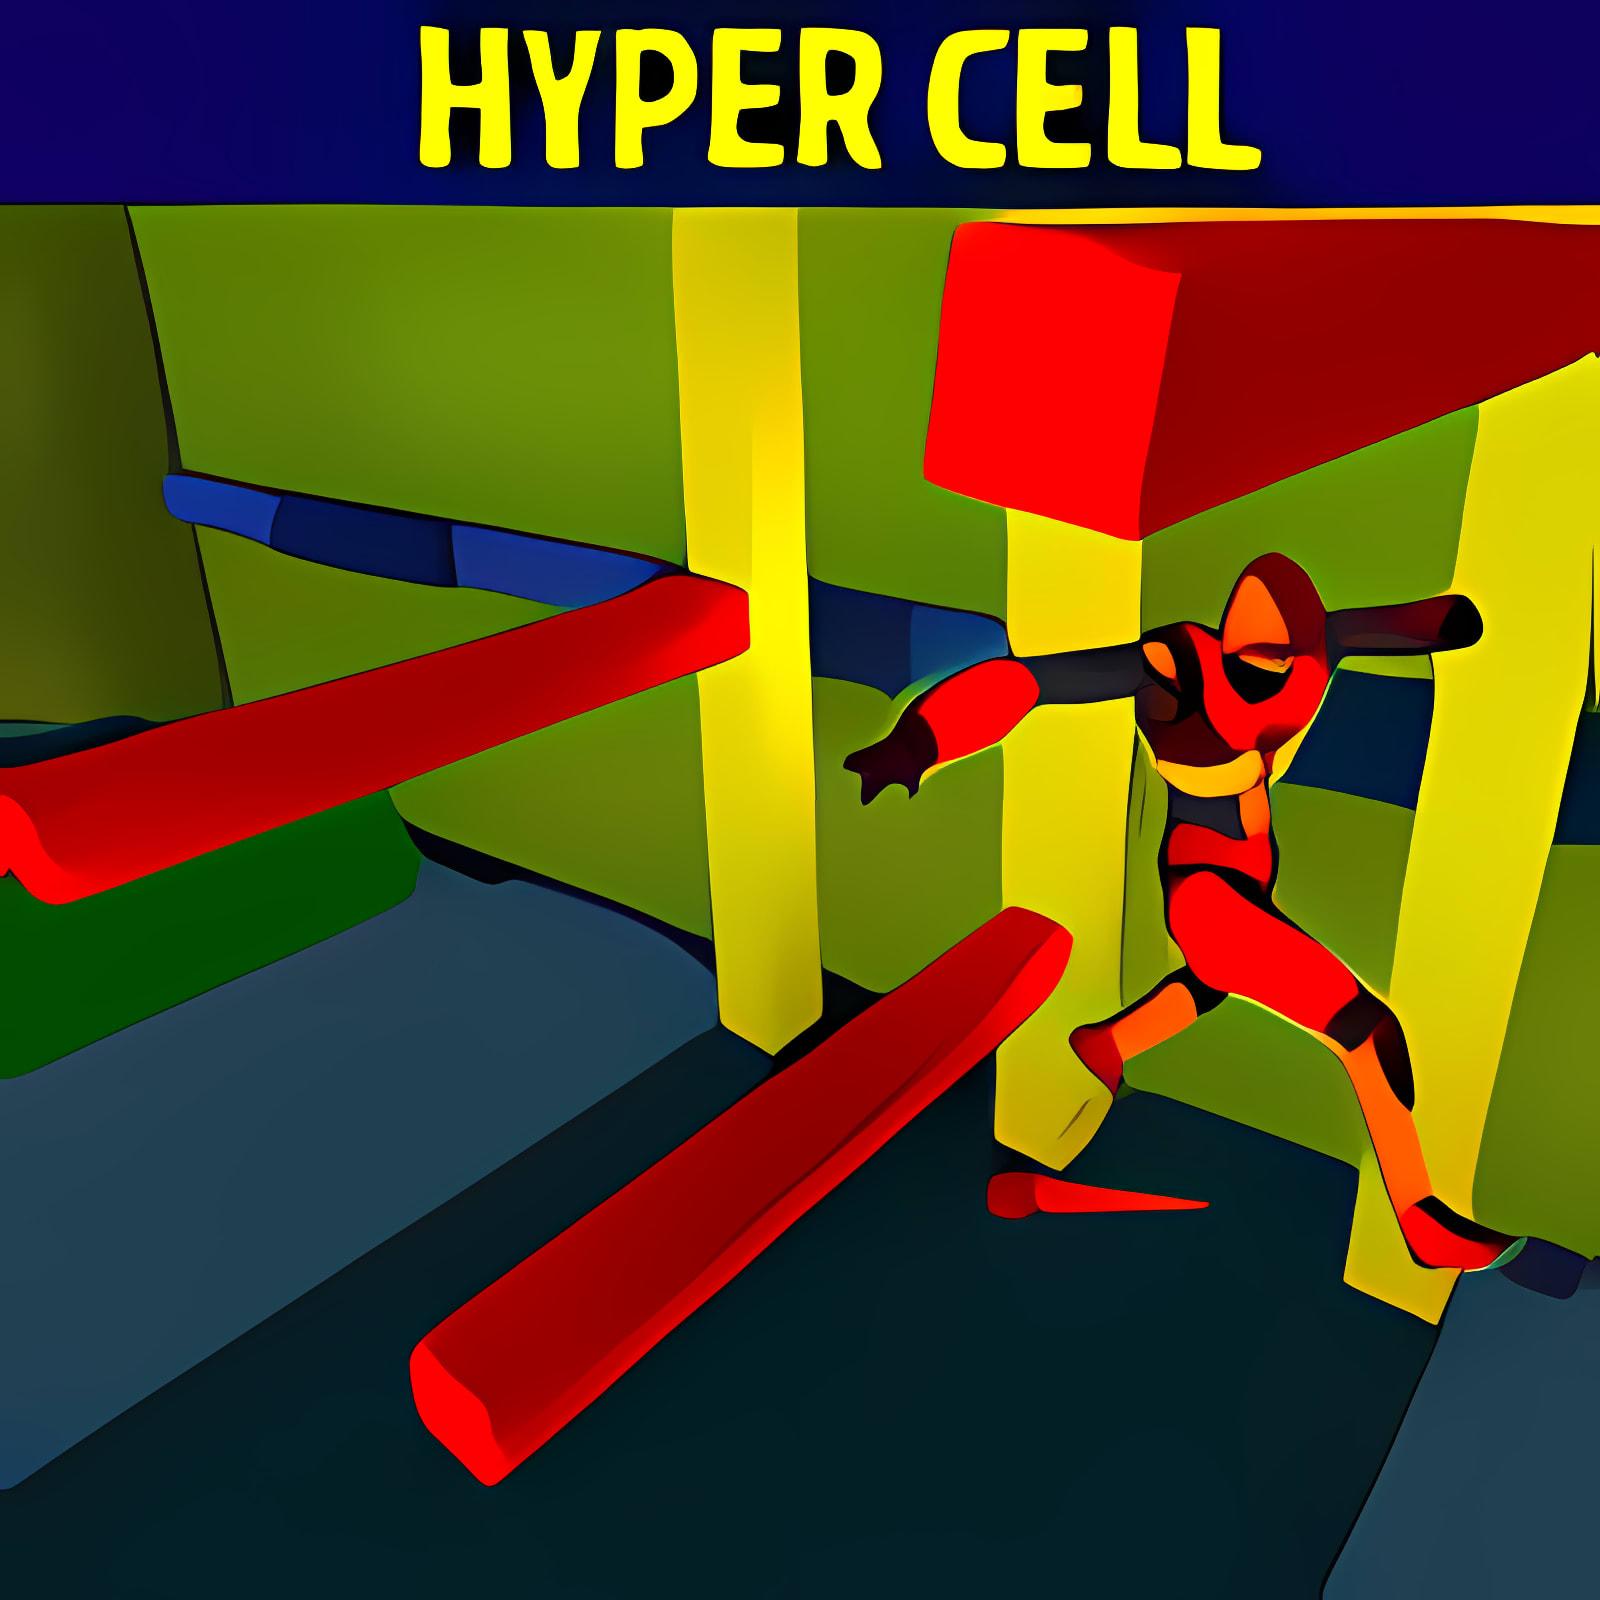 Hyper Cell